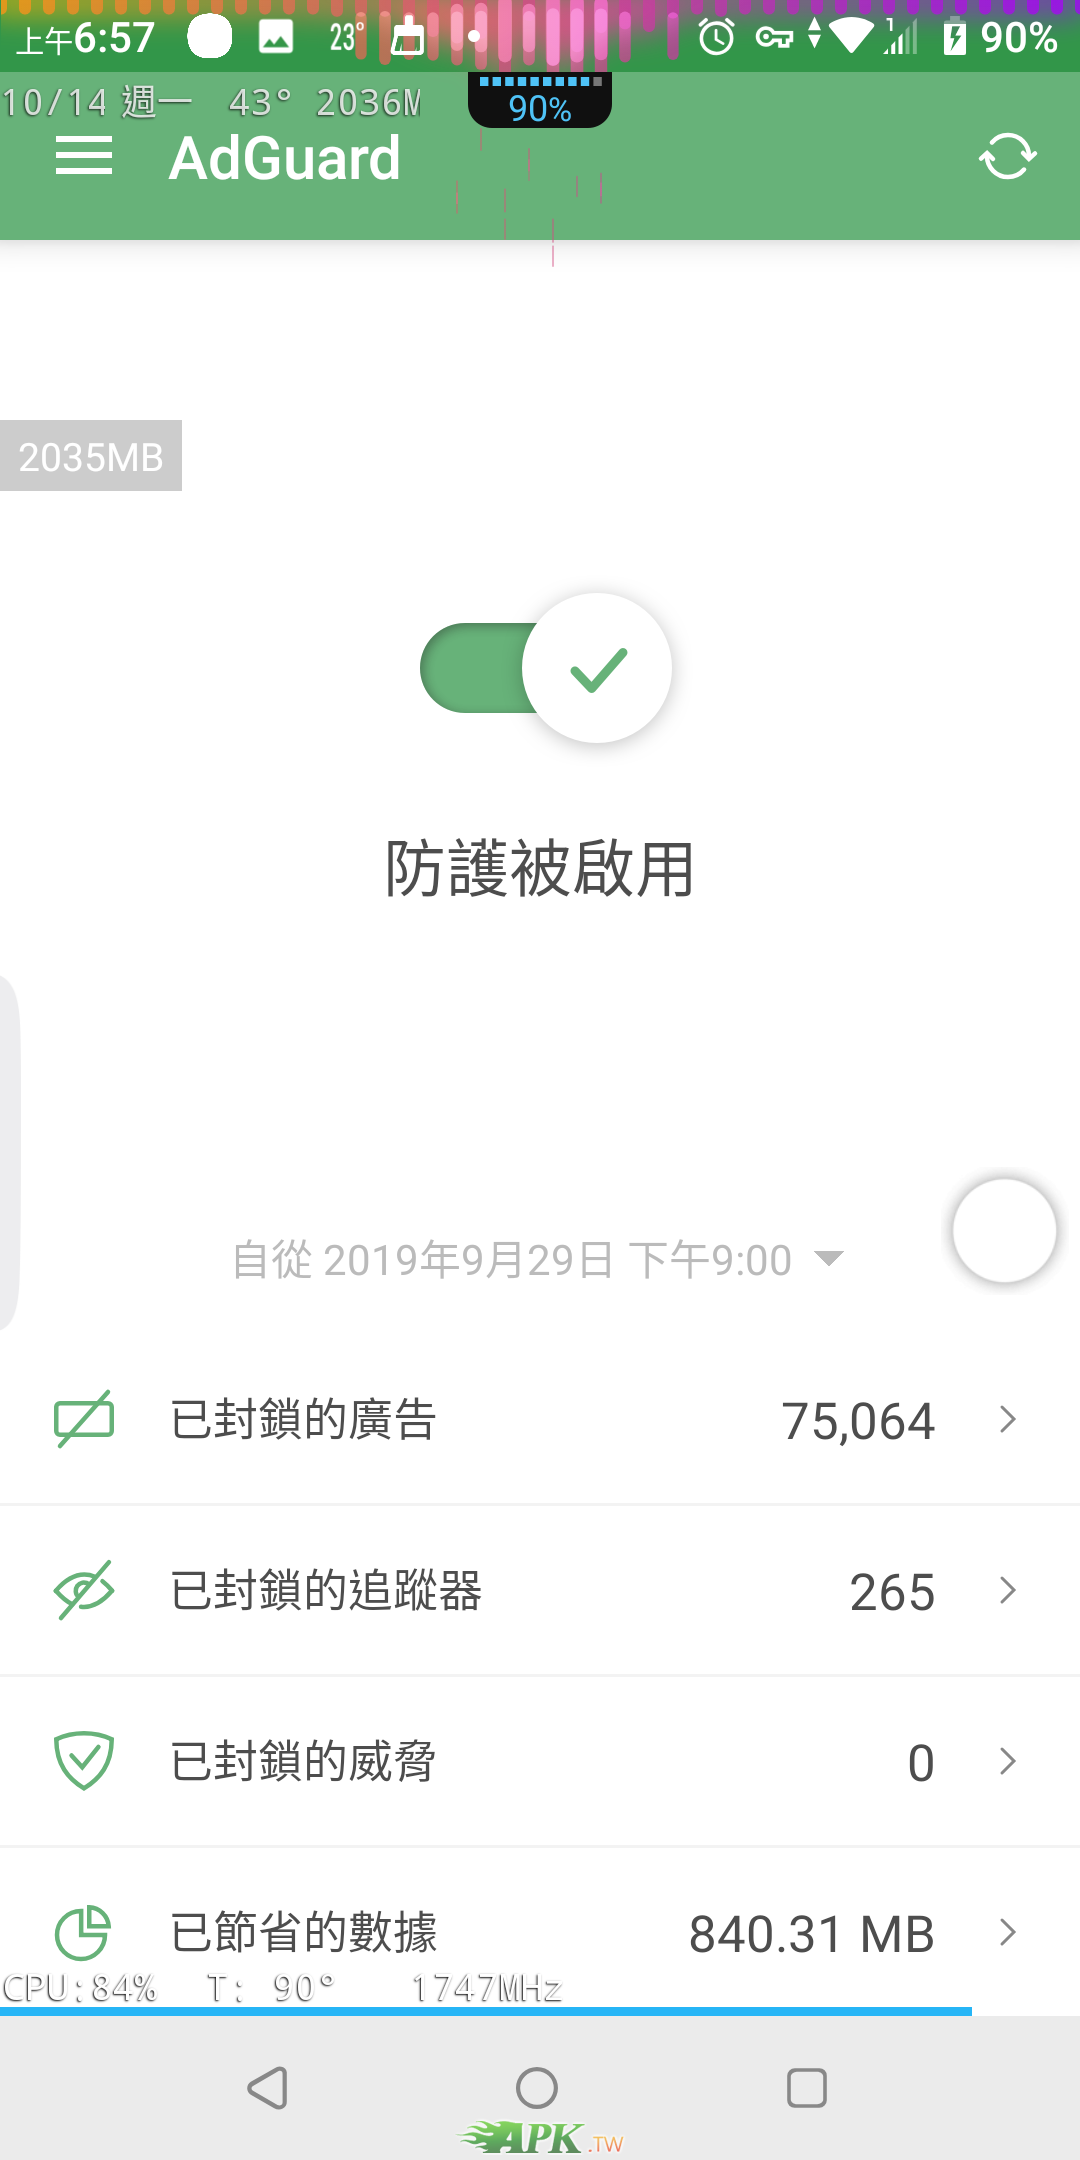 Screenshot_20191014-065800.png